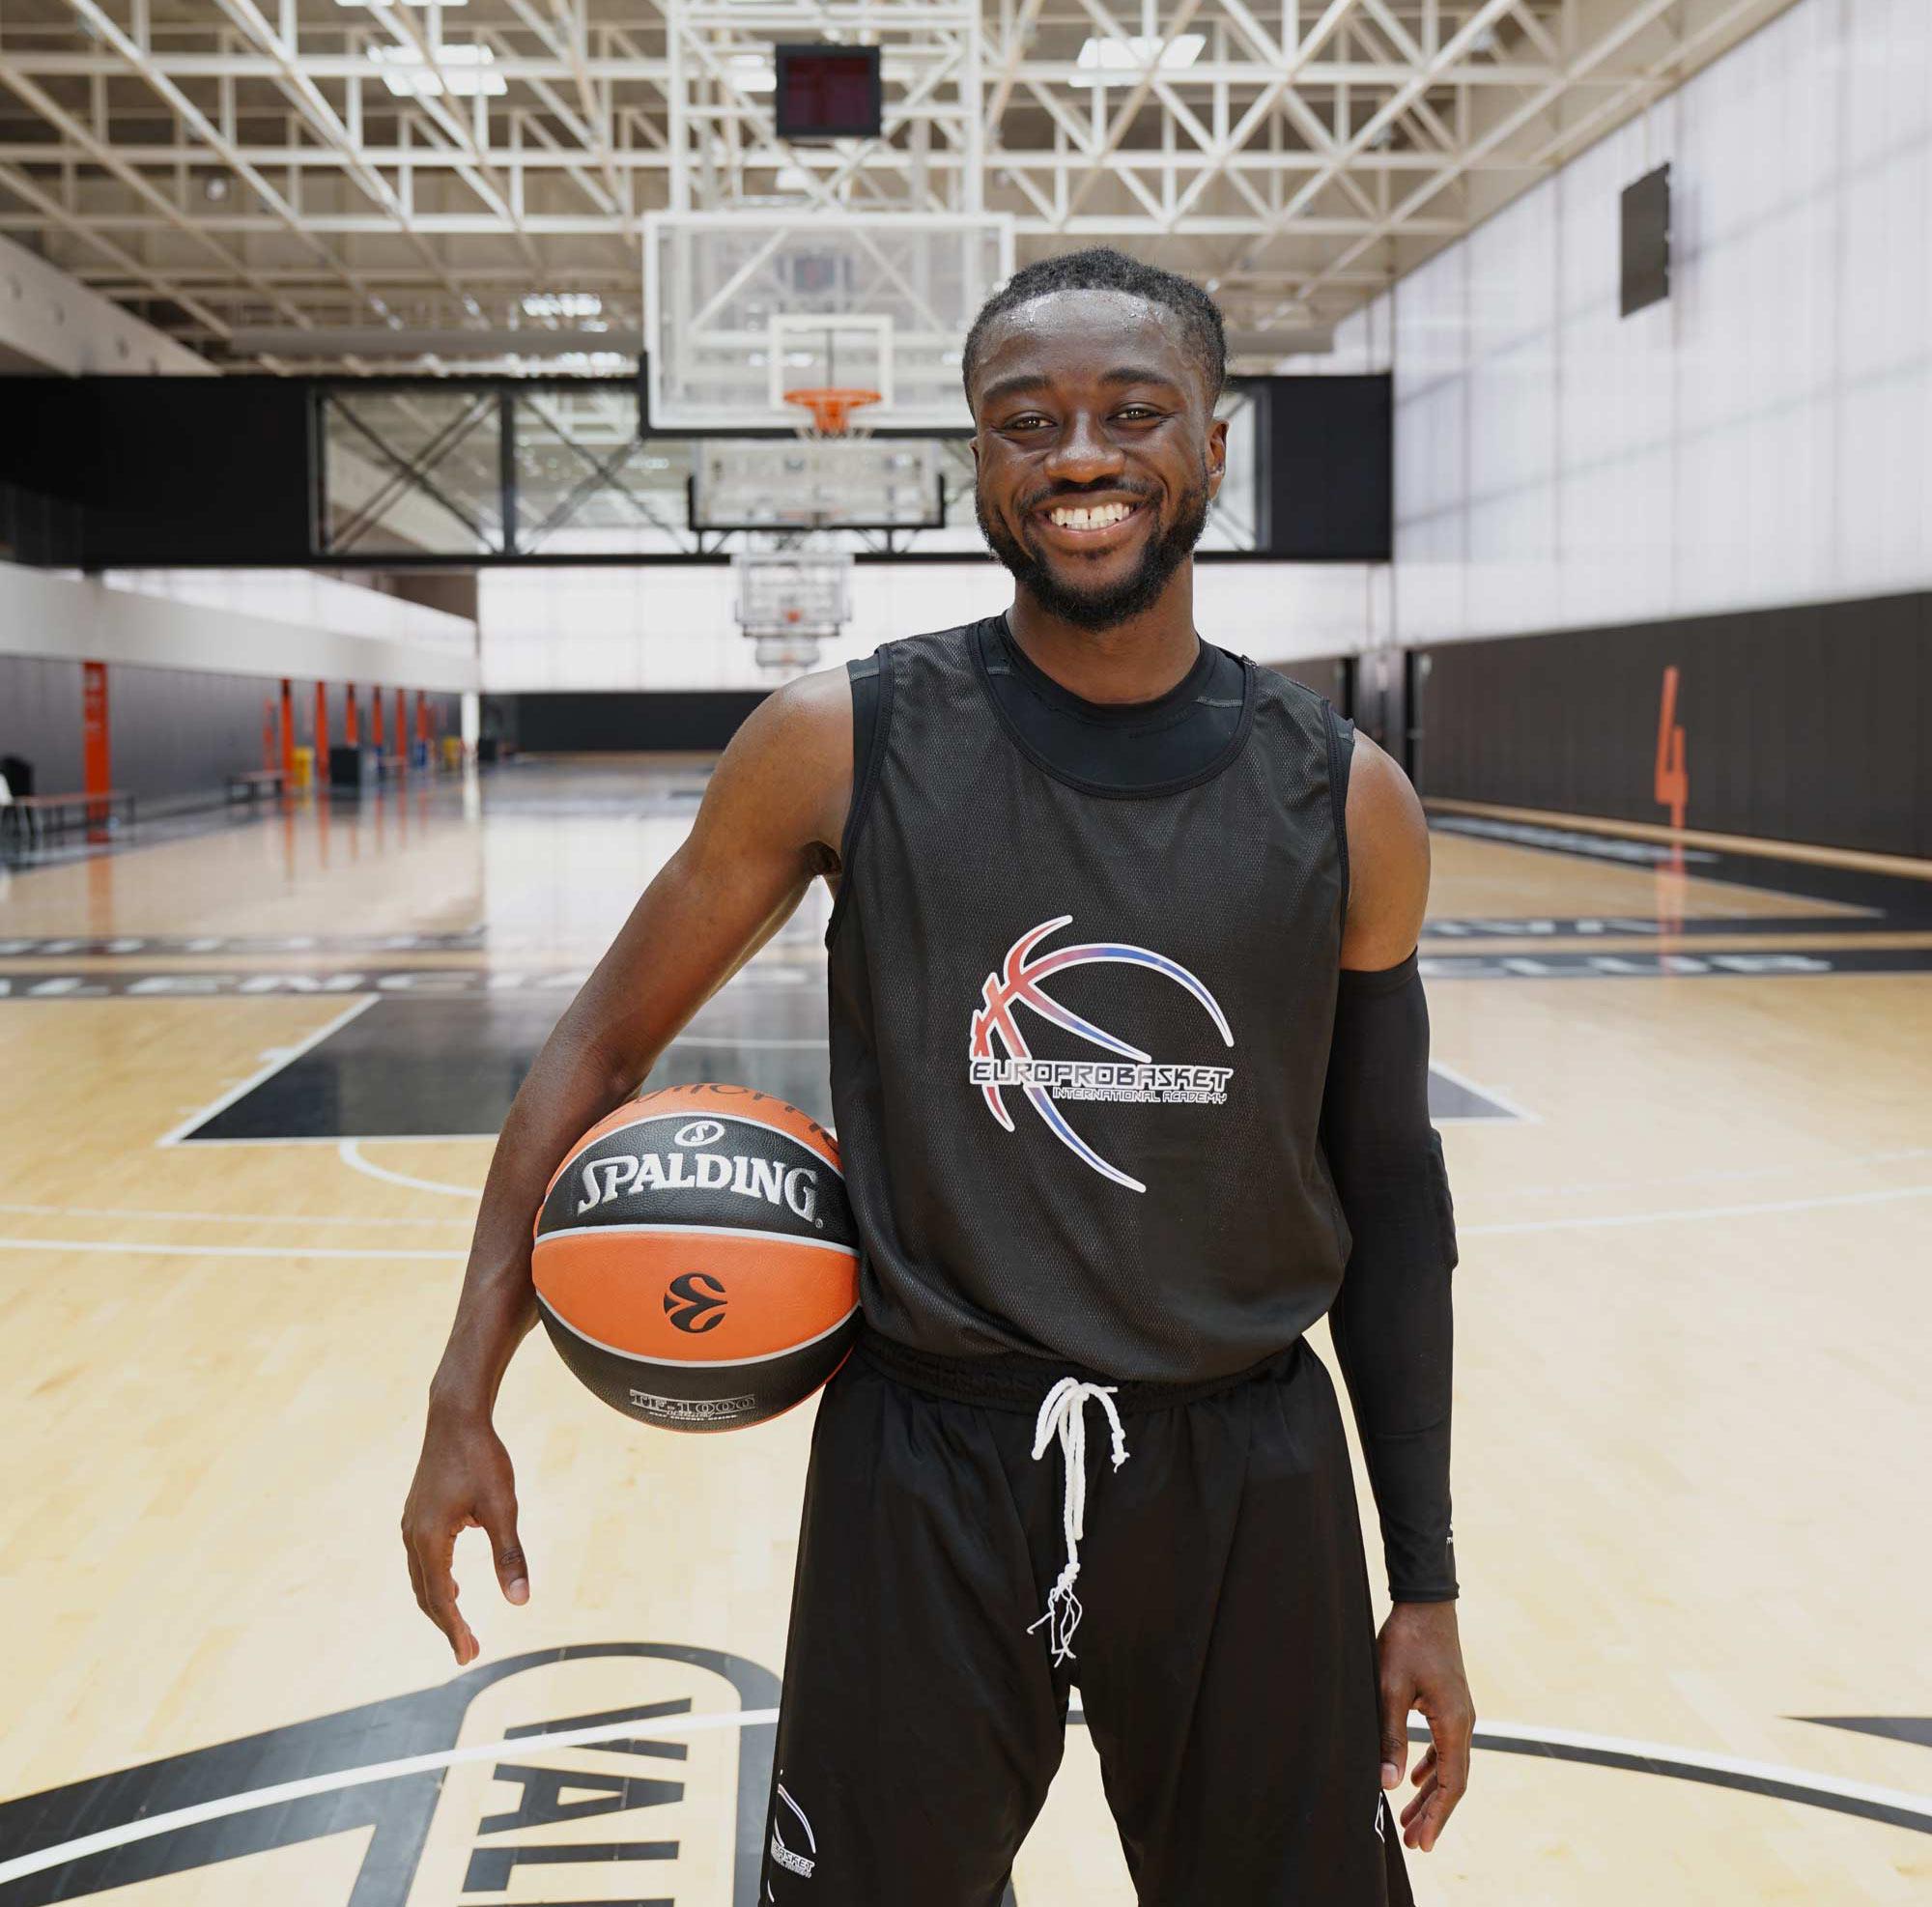 James Agyeman europrobasket basketball